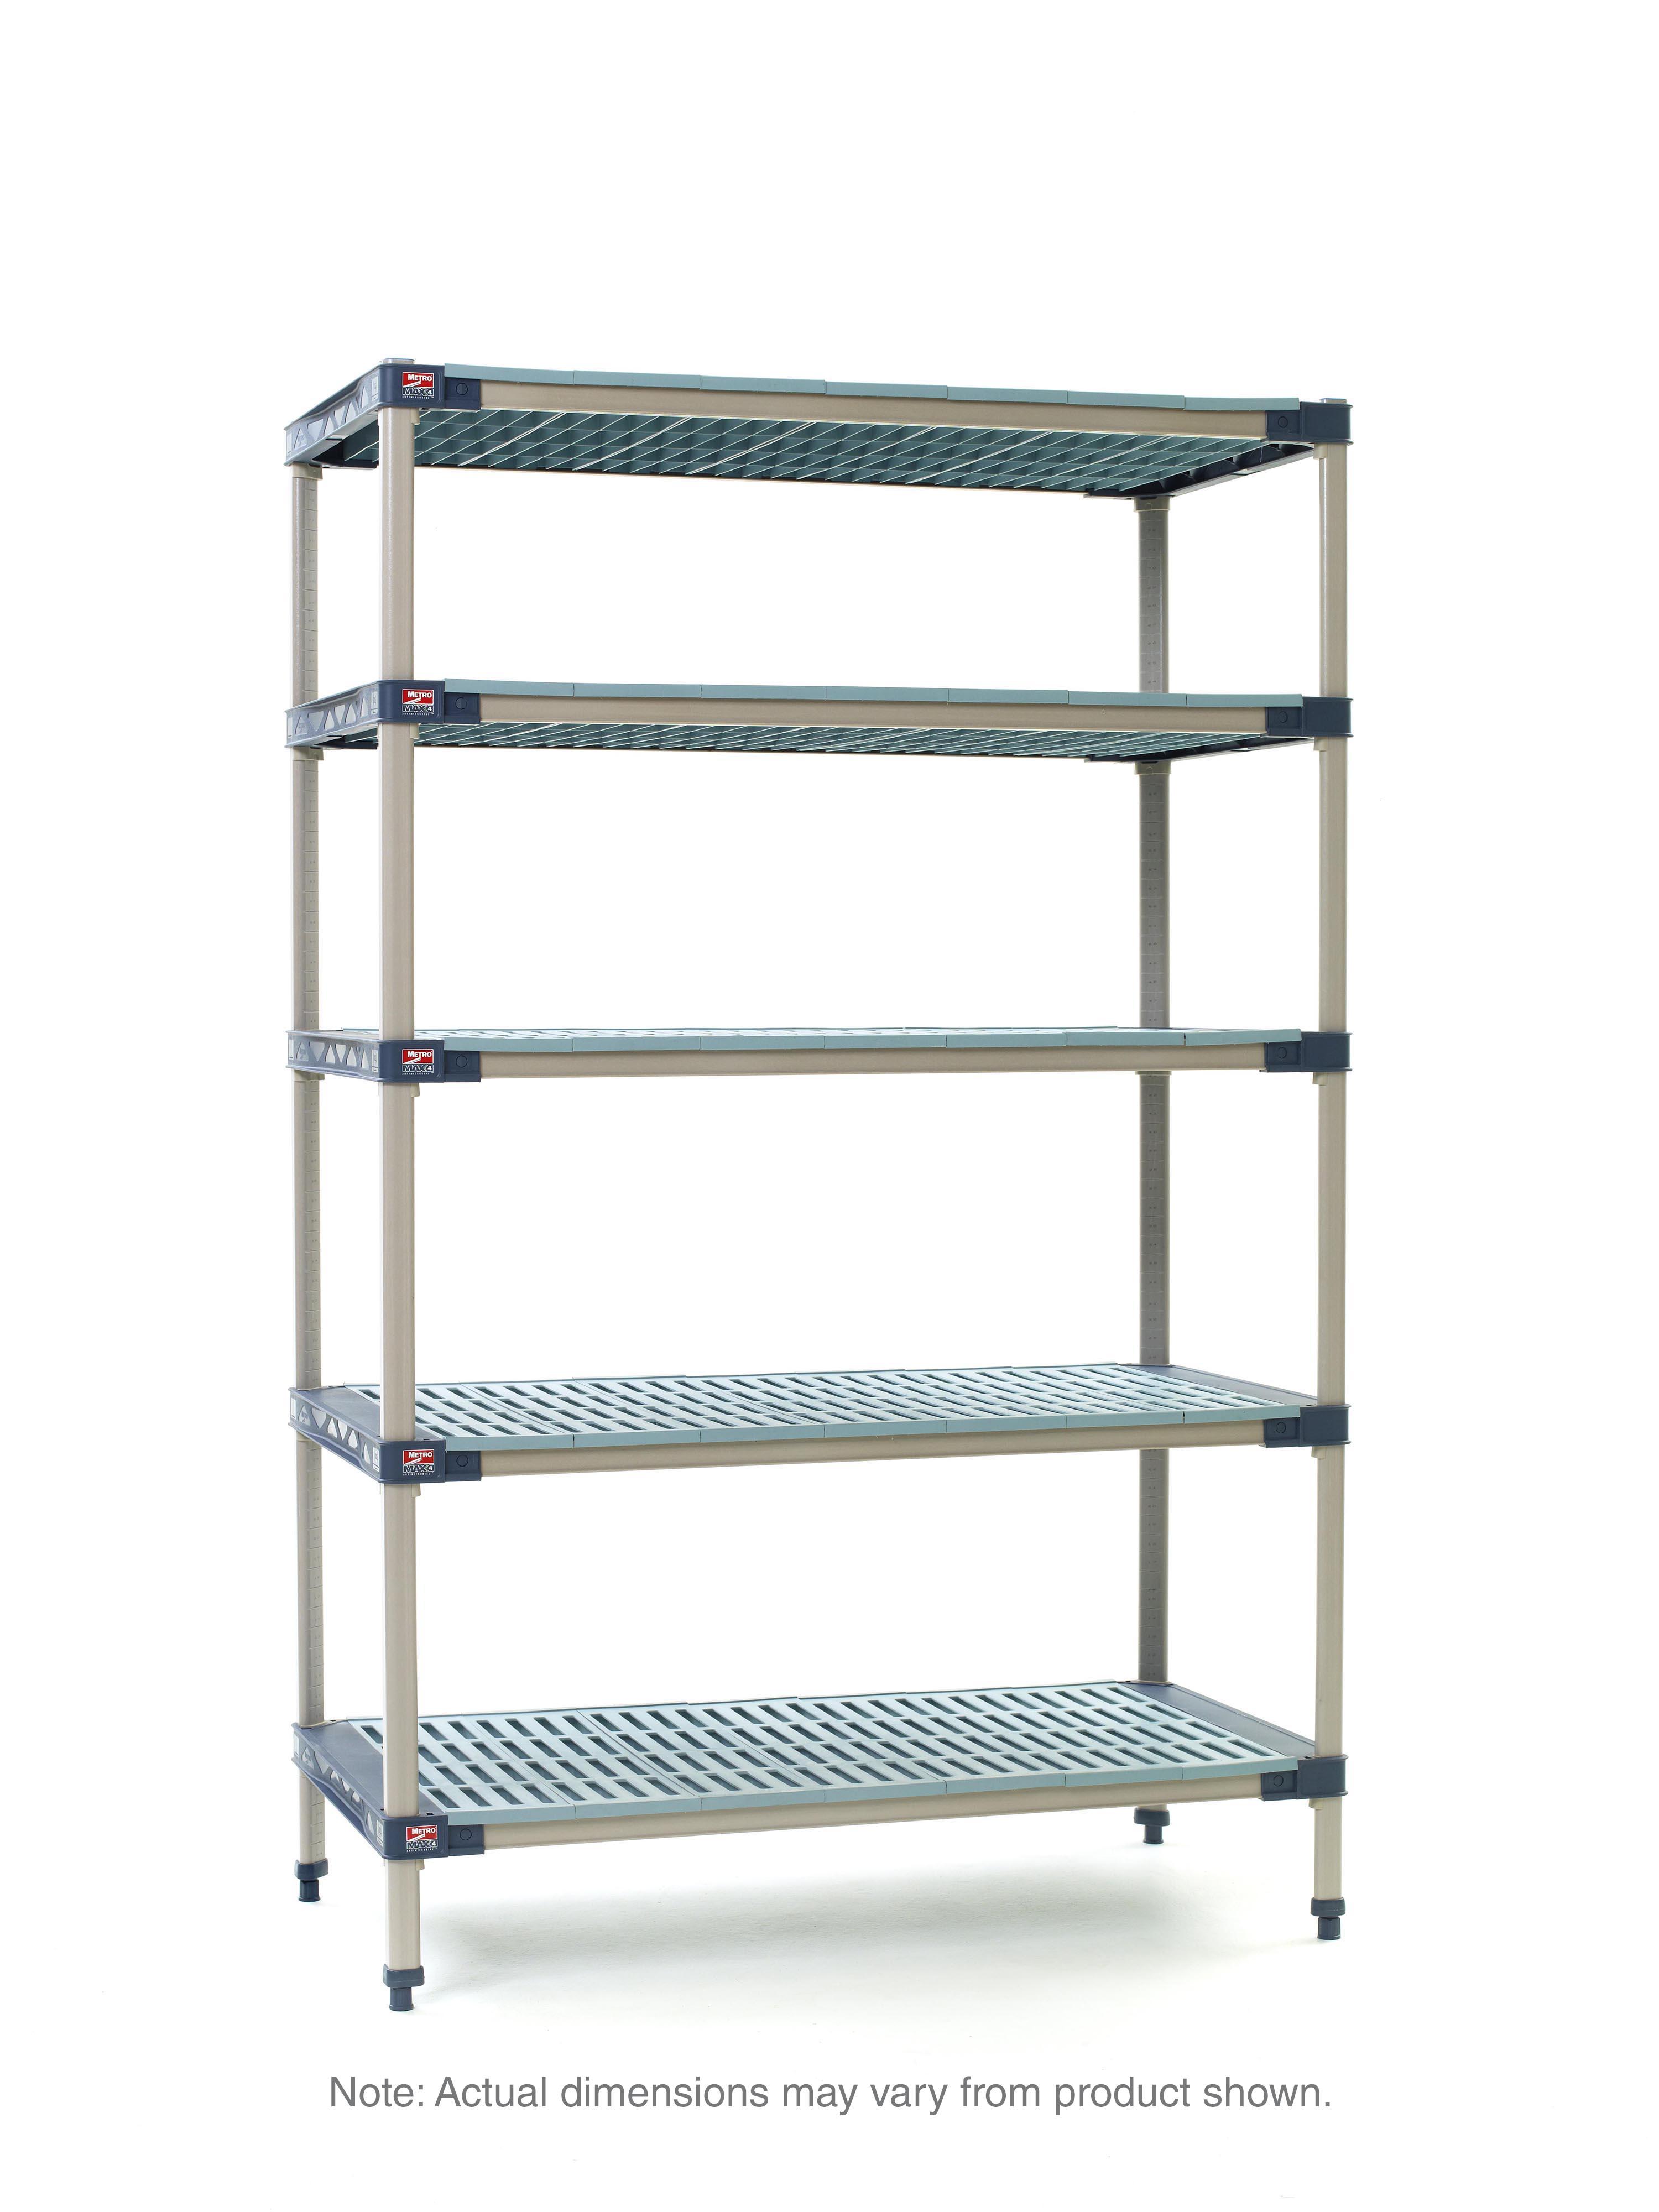 Polymer Shelving Metromax Iq Storage System Metromax 4